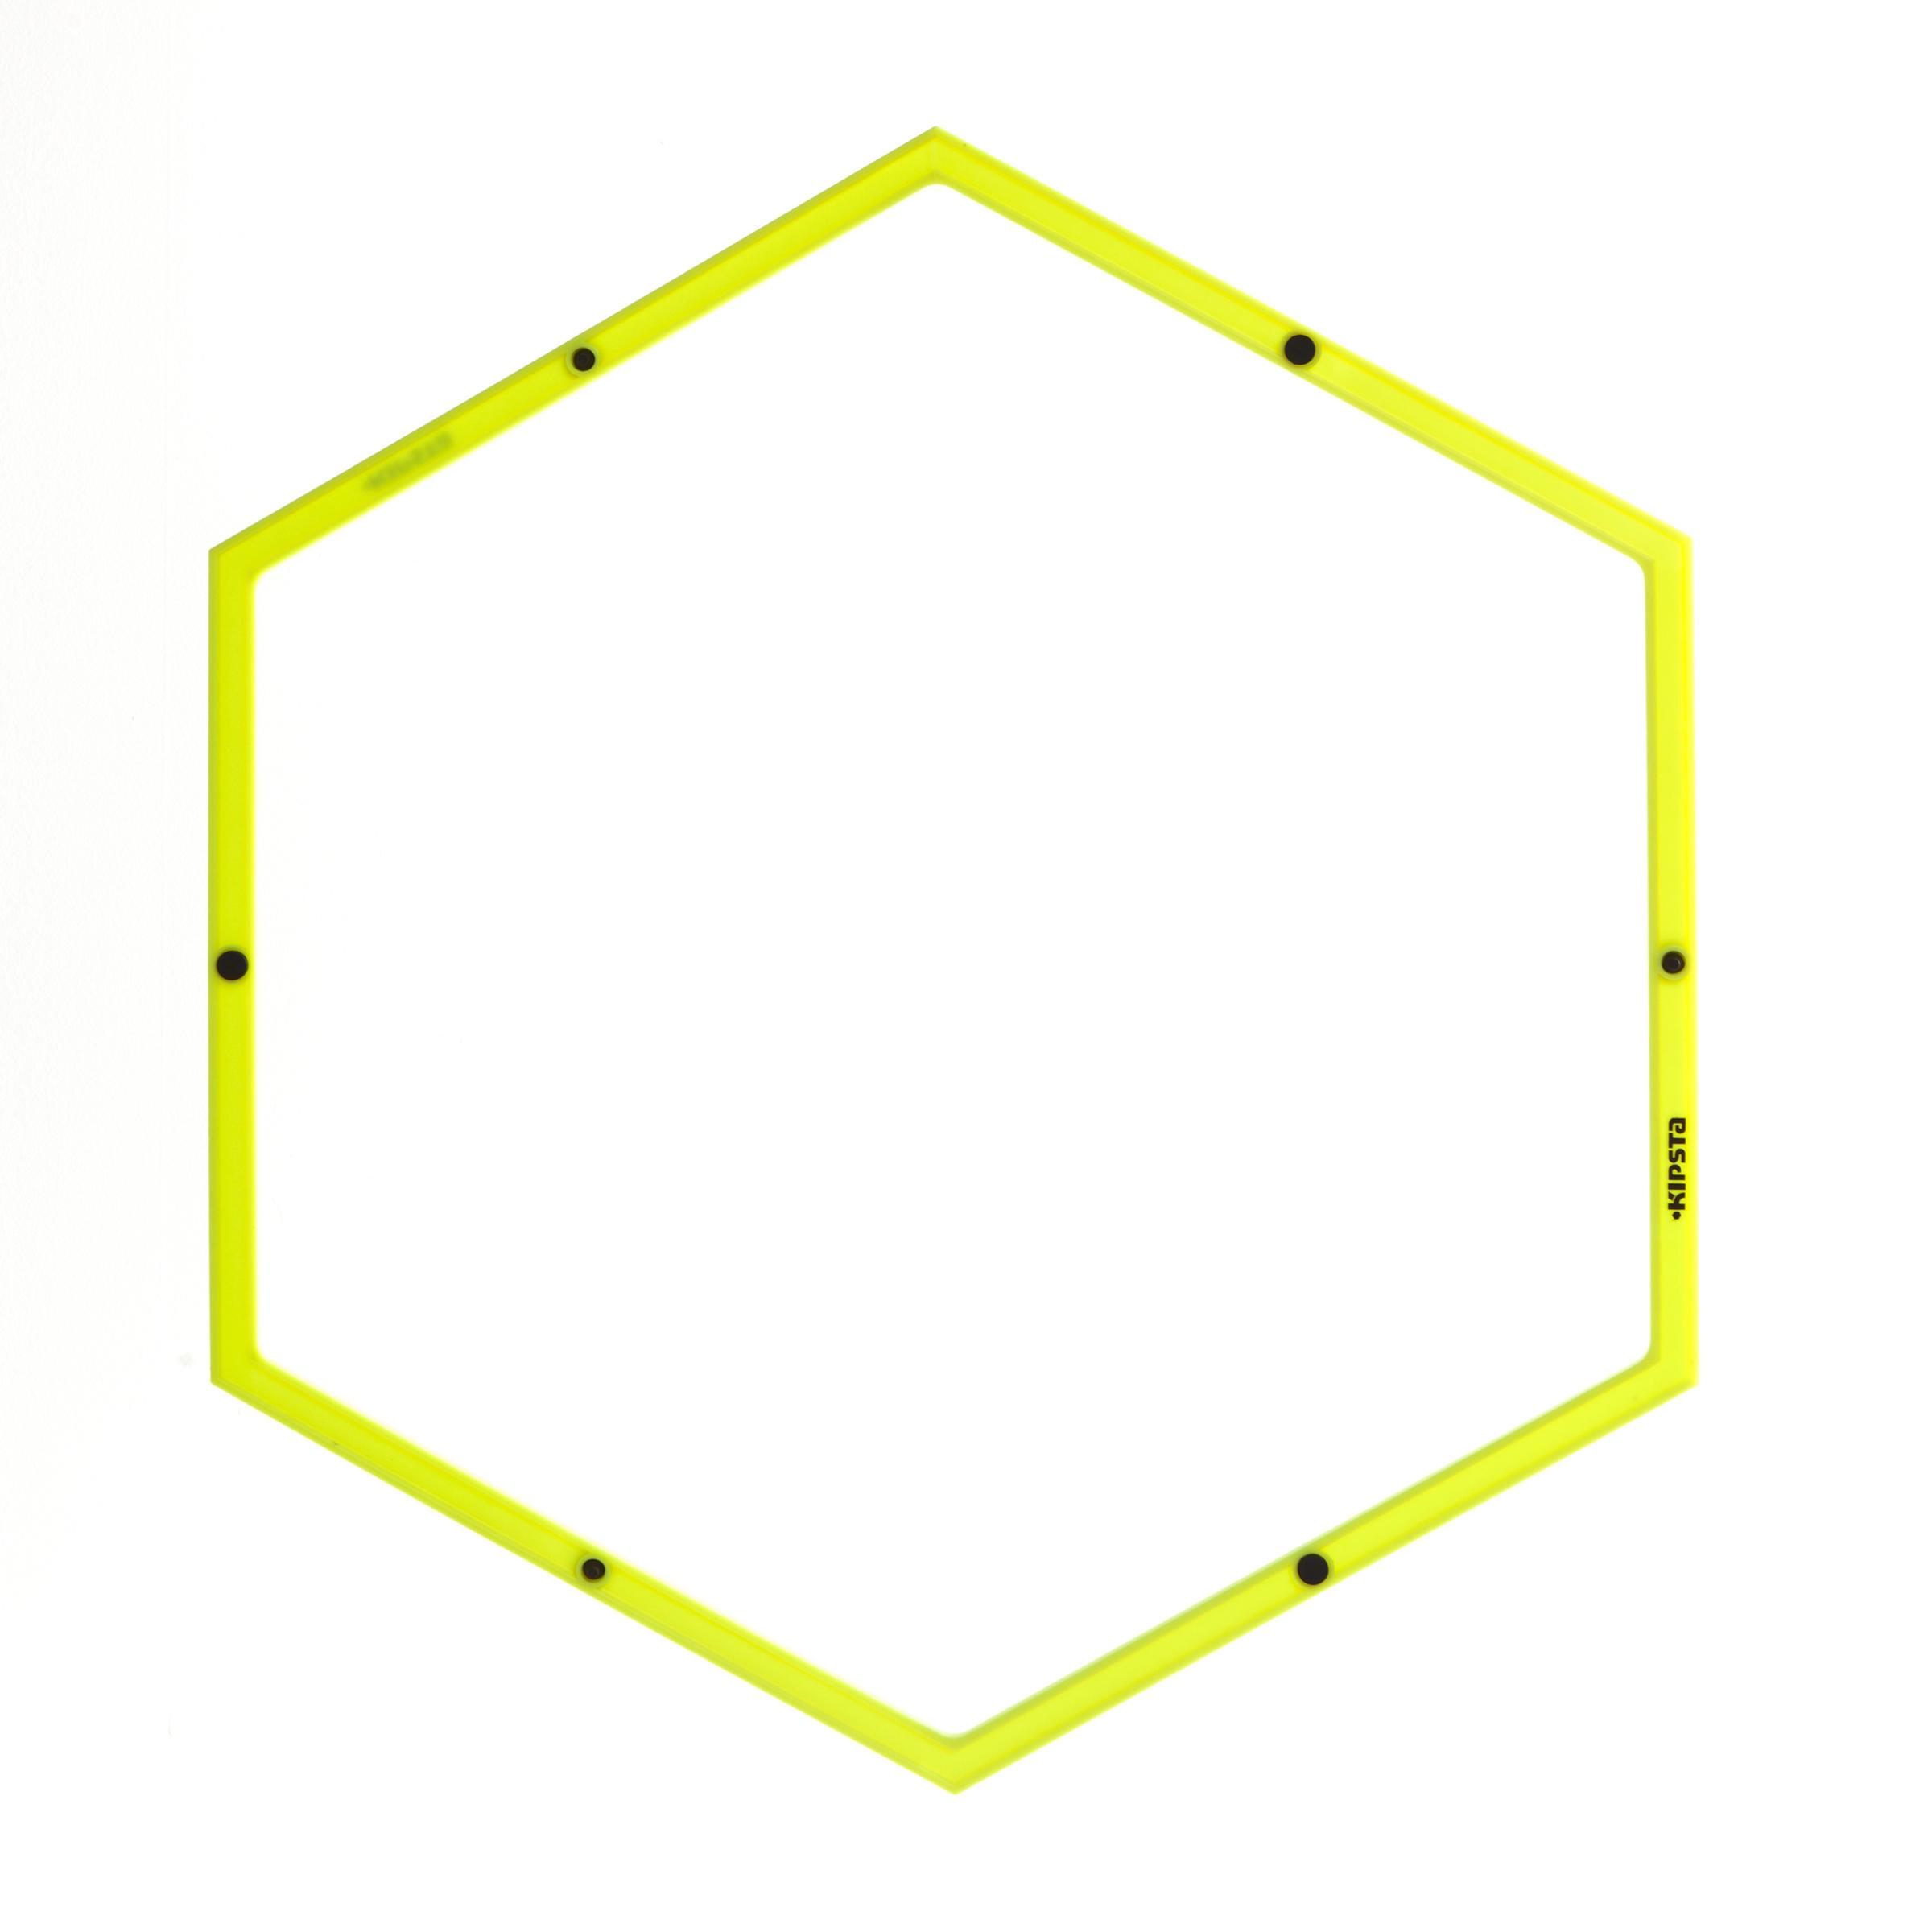 Aro universal 58 cm amarillo